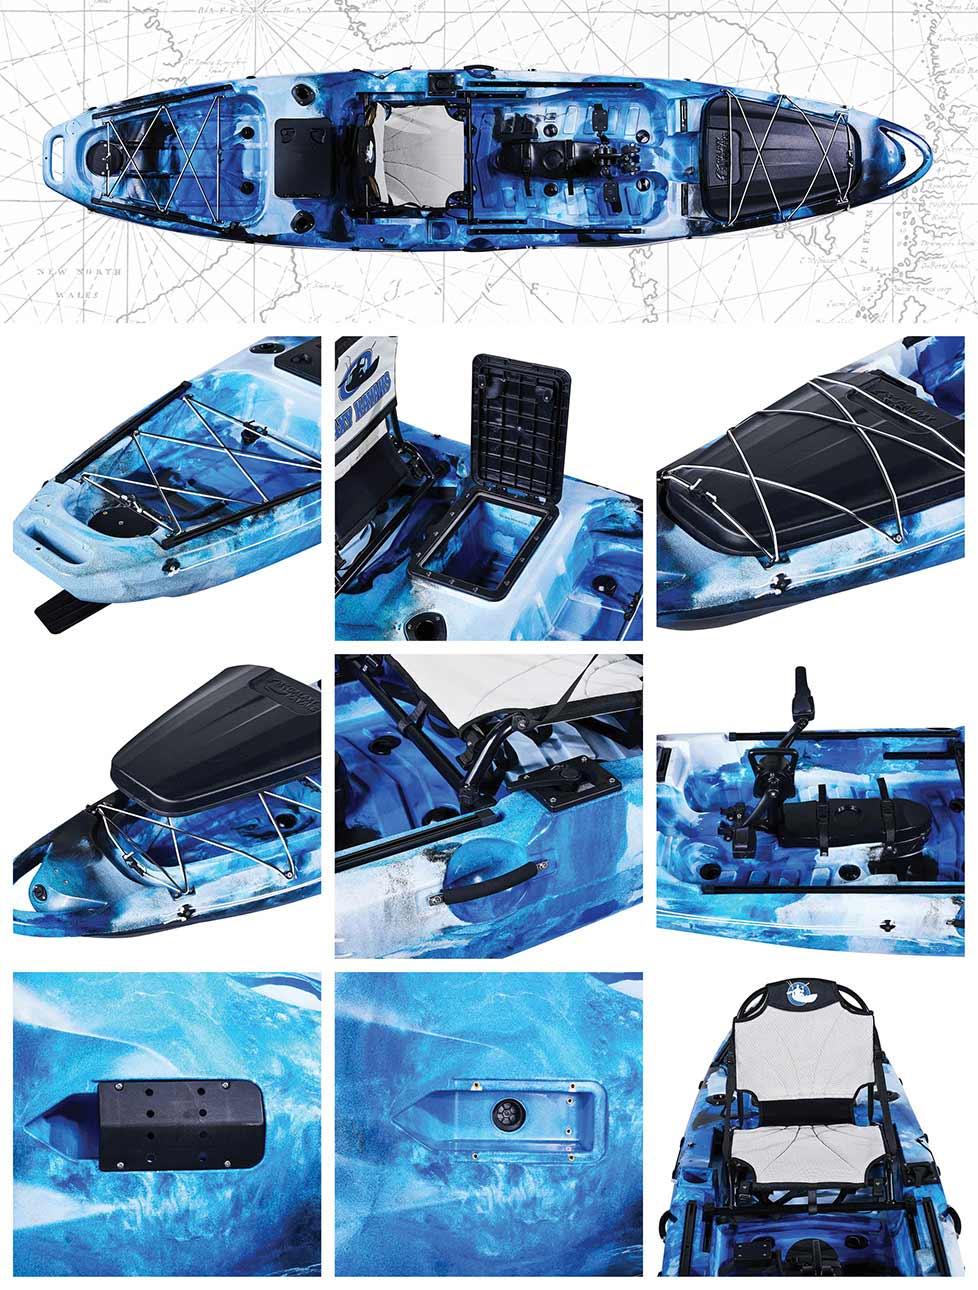 Kayak Overview Image